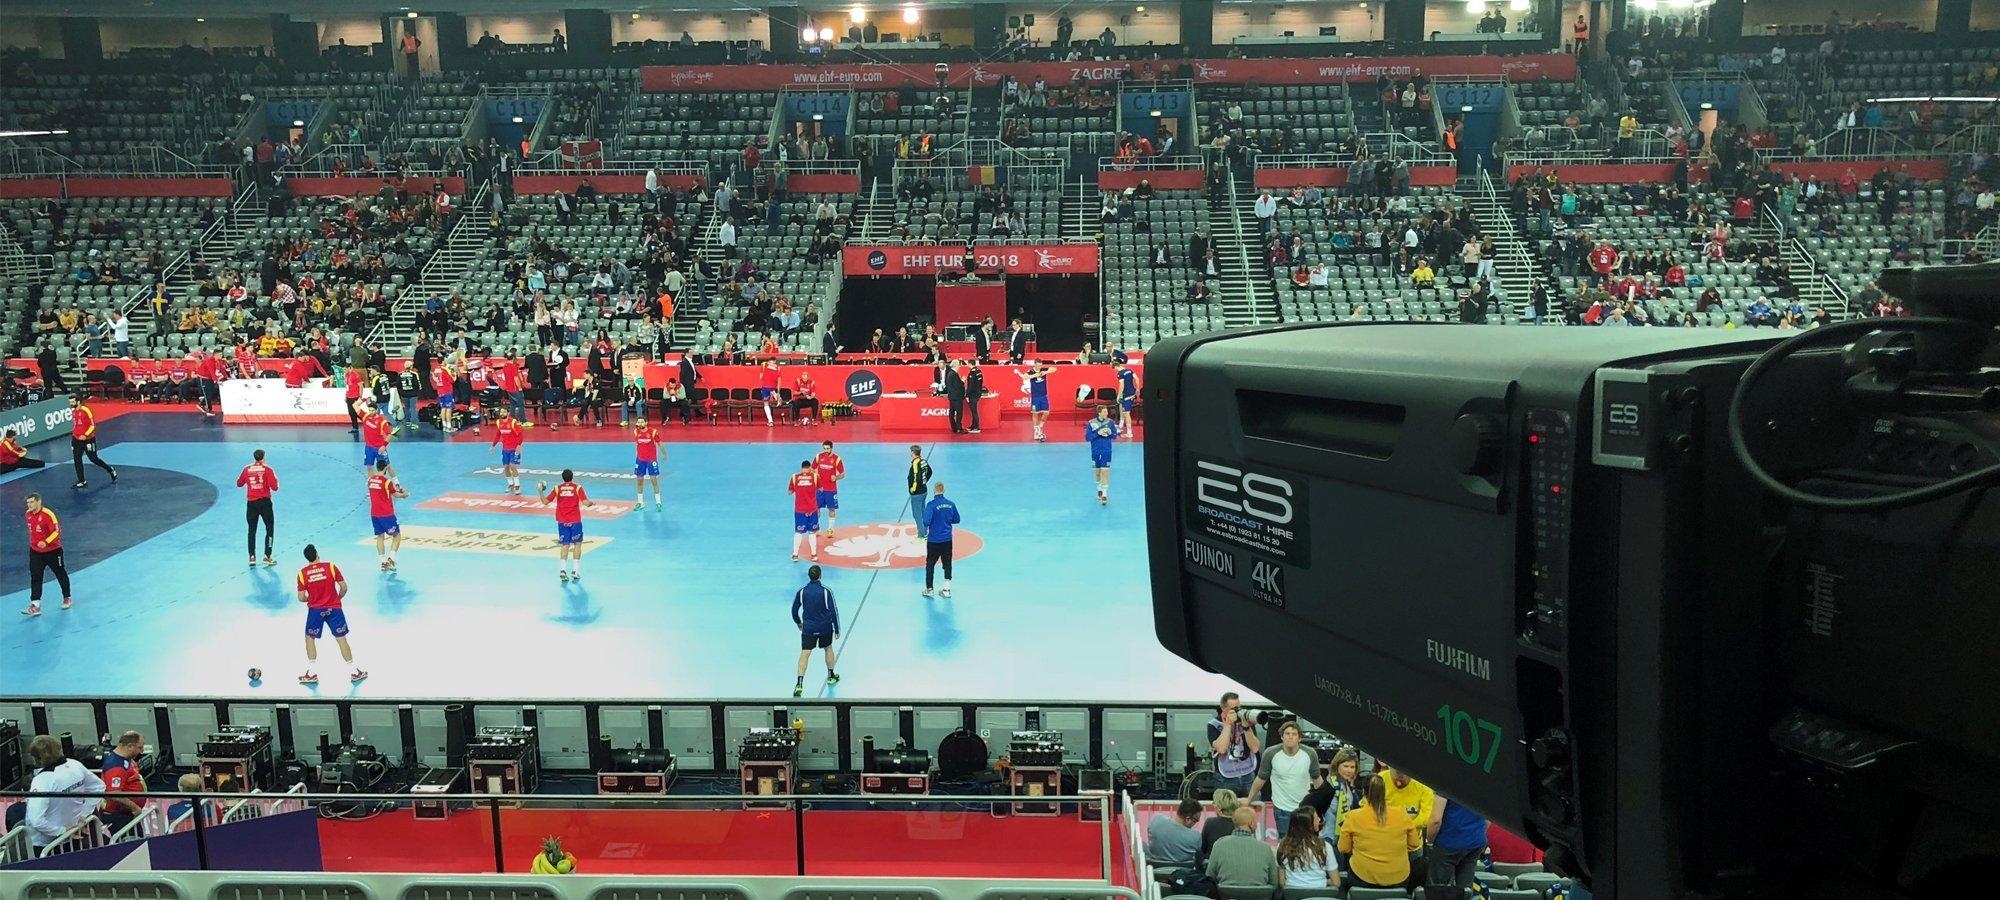 Fujinon UA107 lenses from ES Broadcast Hire were used at the European Men's Handball Championships